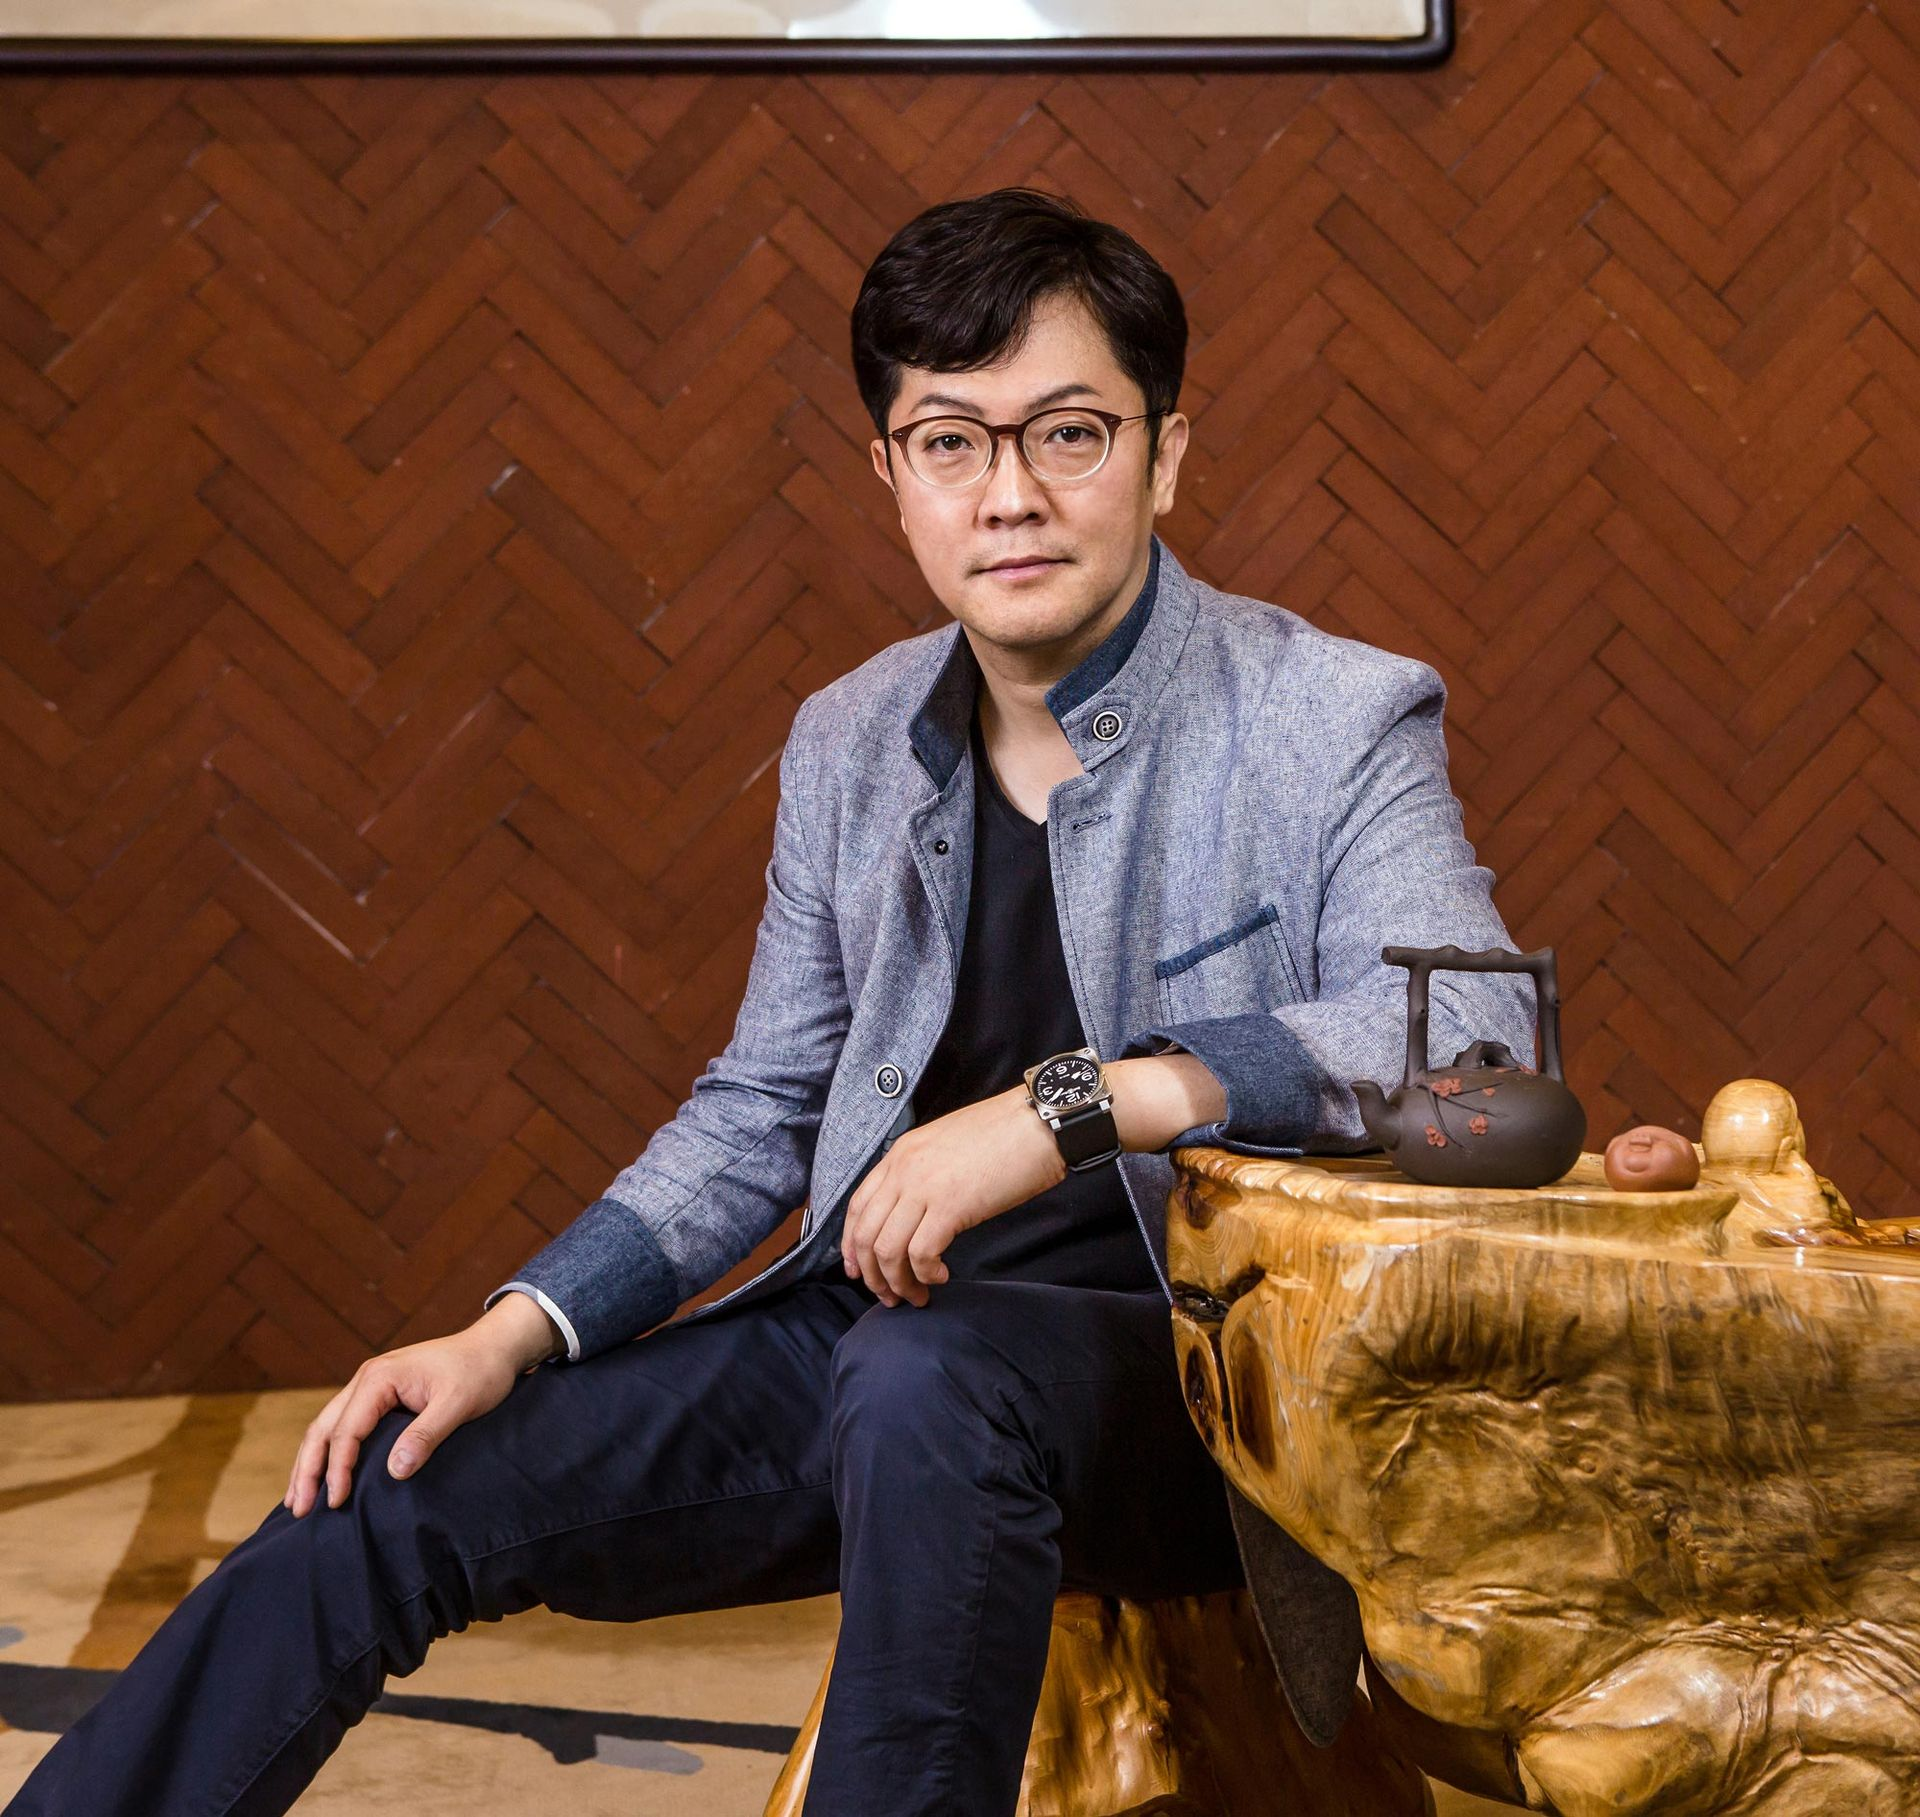 Vi har pratat med Huaweis designchef Joon Suh Kim